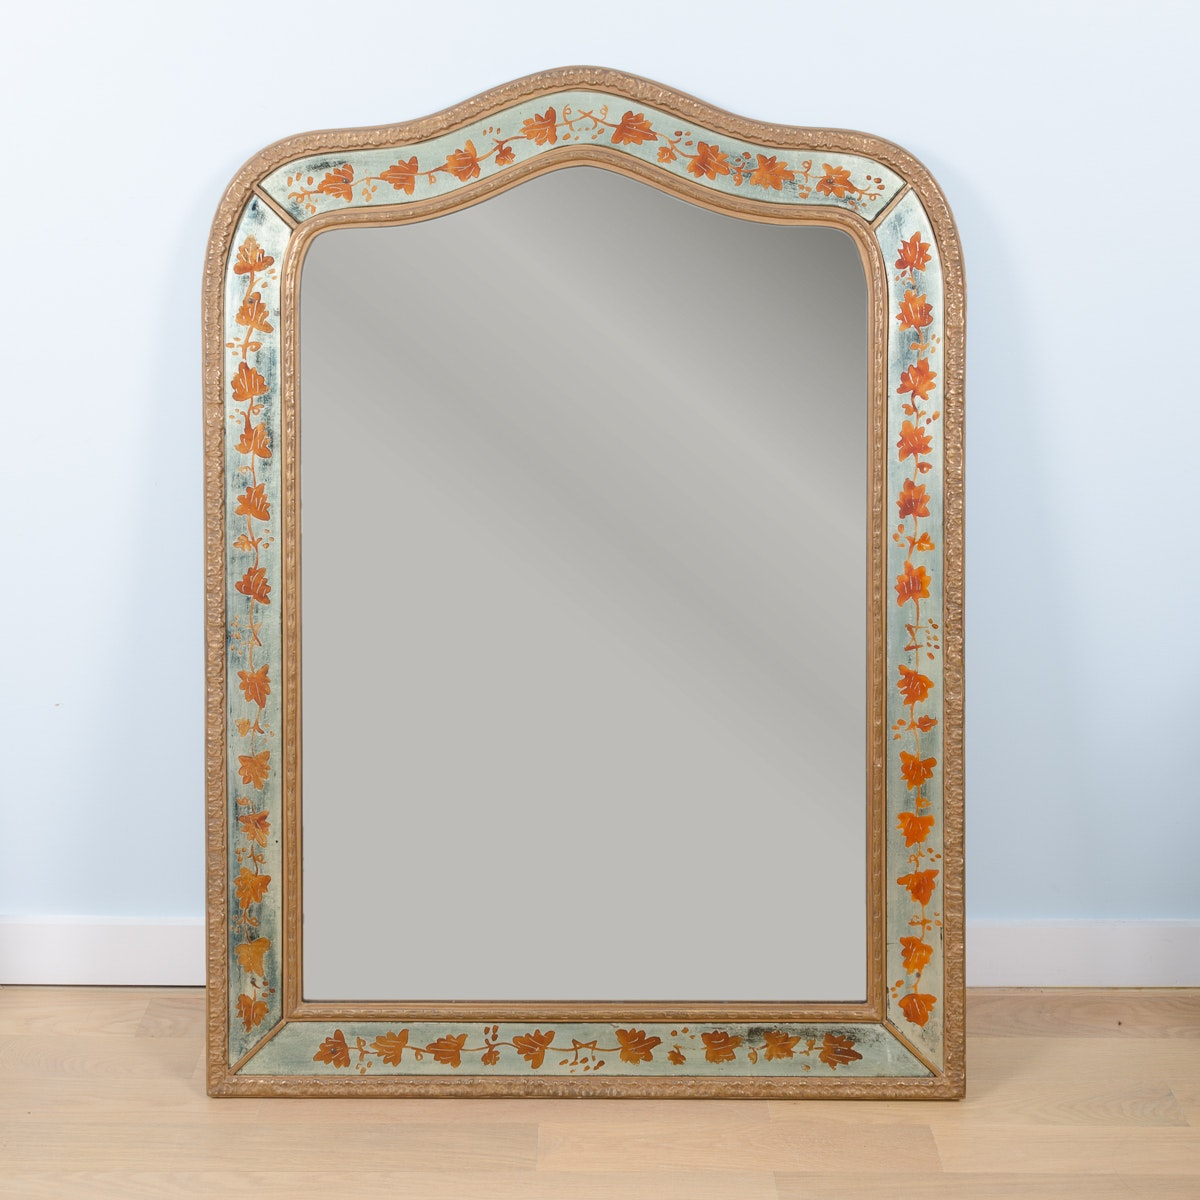 Vintage Venetian Style Painted Wall Mirror